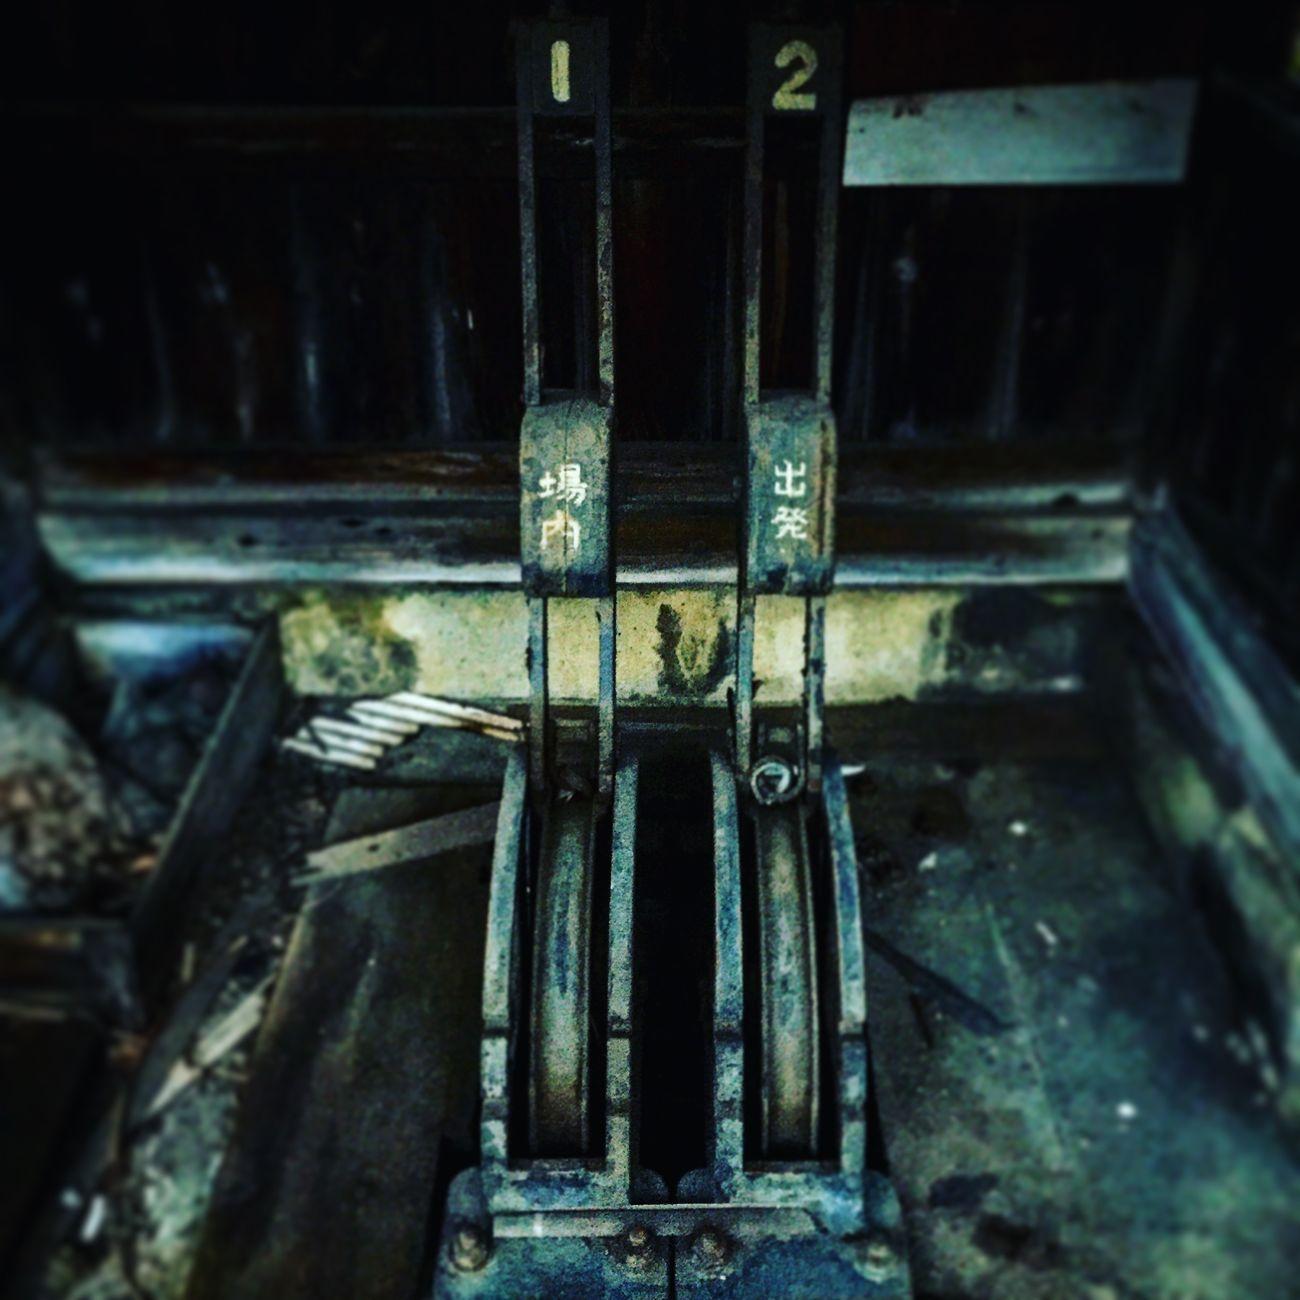 Ruins Japan 廃墟 IPhoneography Iphone6 Catnip NEONIP